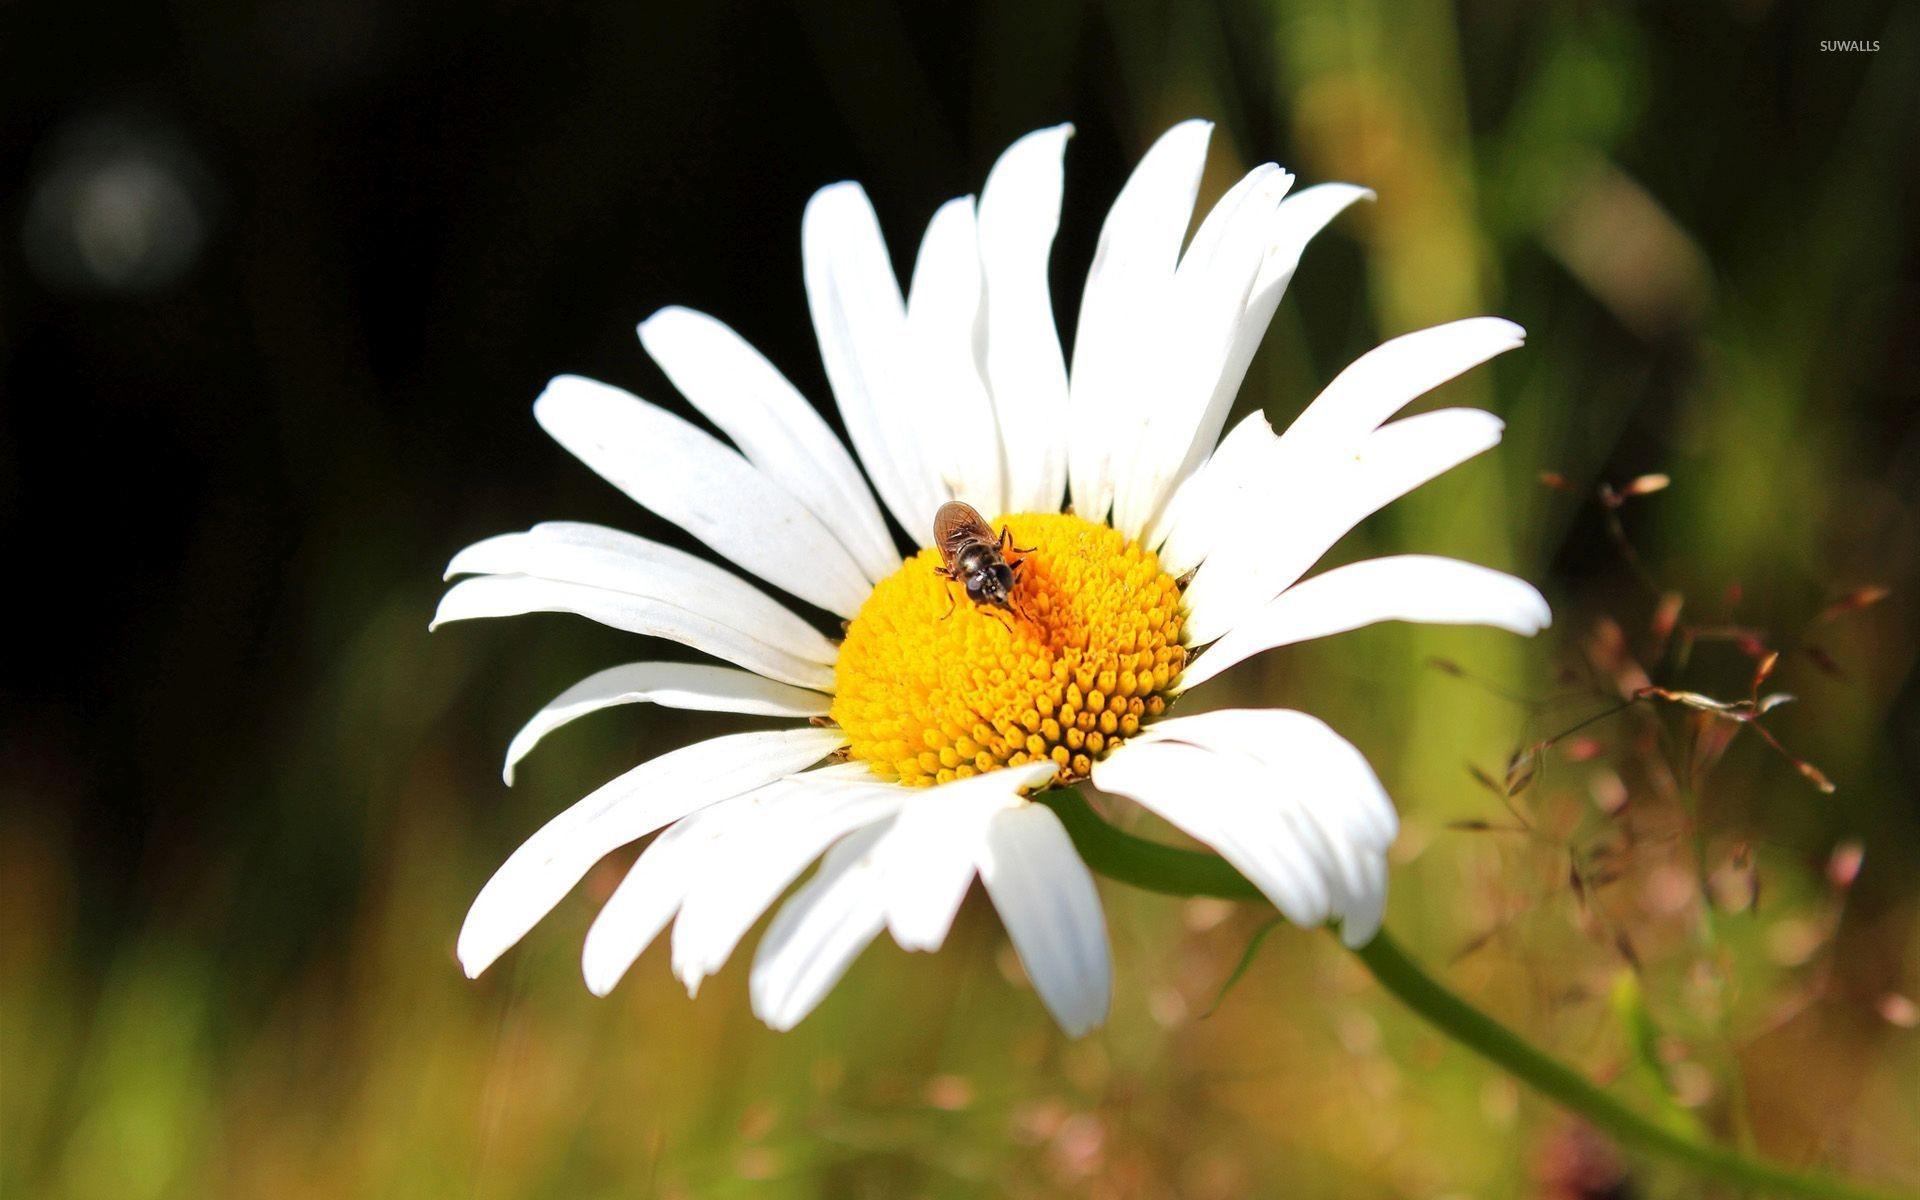 Res: 1920x1200, Bug on a white chrysanthemum wallpaper